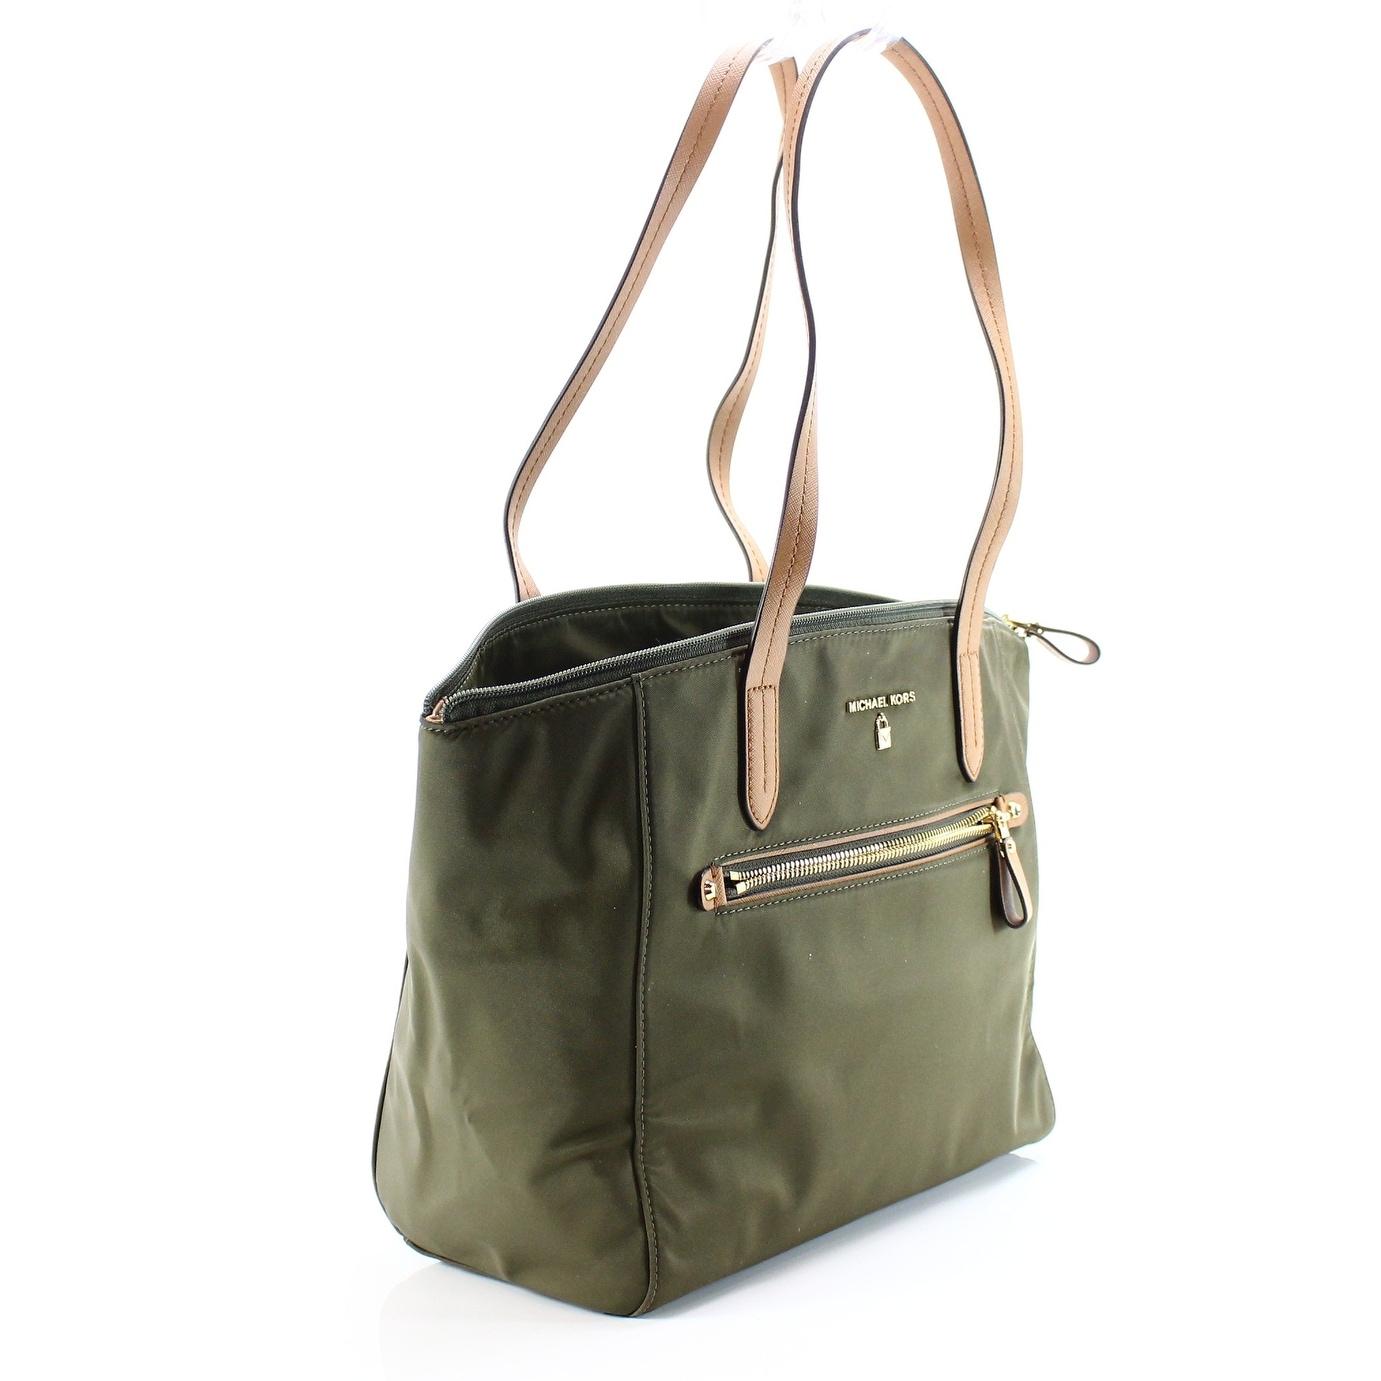 Michael Kors New Kelsey Olive Green Medium Top Zip Tote Handbag Purse Free Shipping Today 19564046